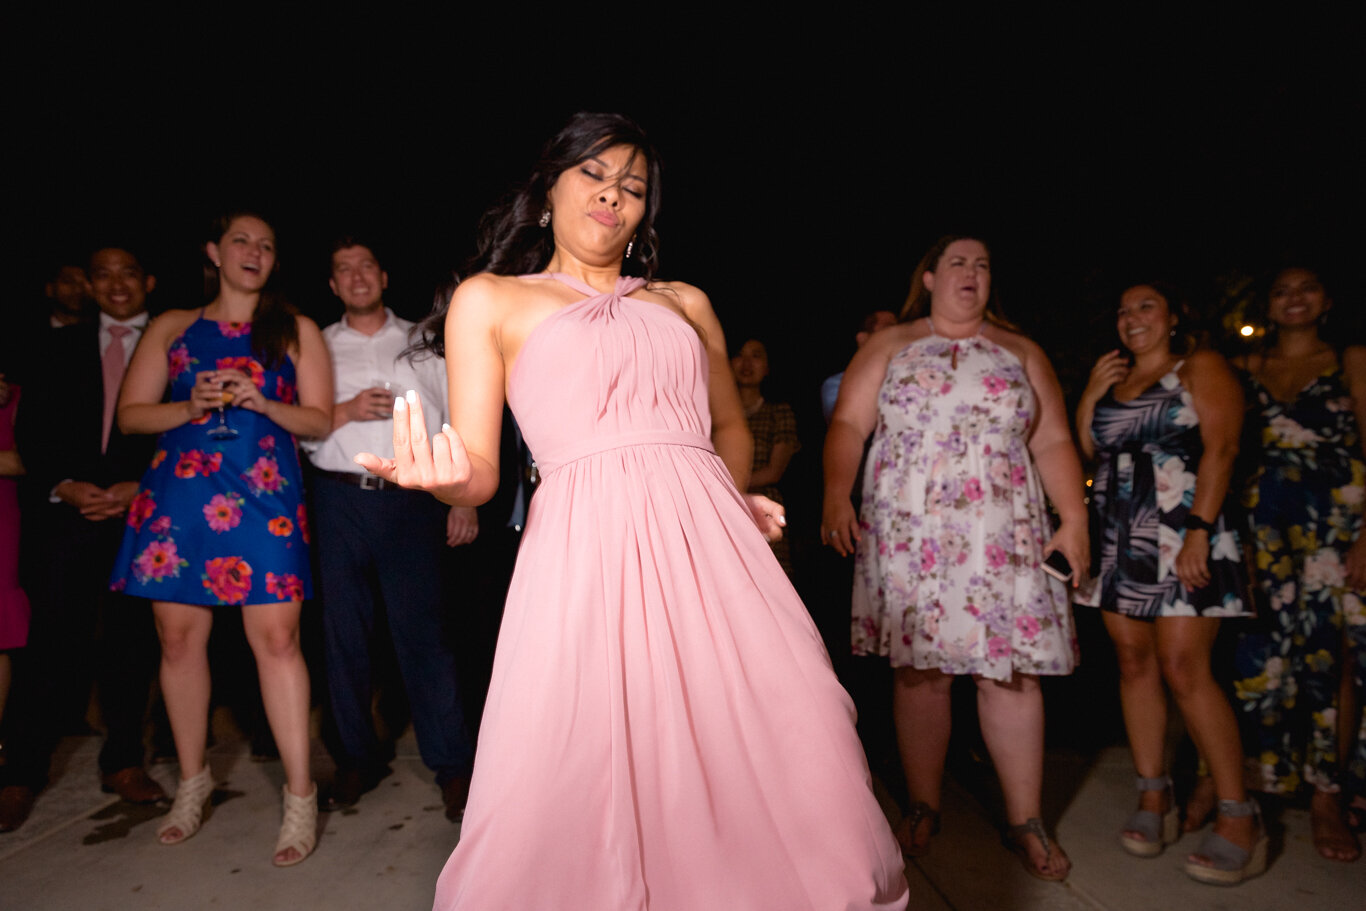 2019.08.24_Emily-Ashir-Wedding-at-the-Maples-6511.jpg